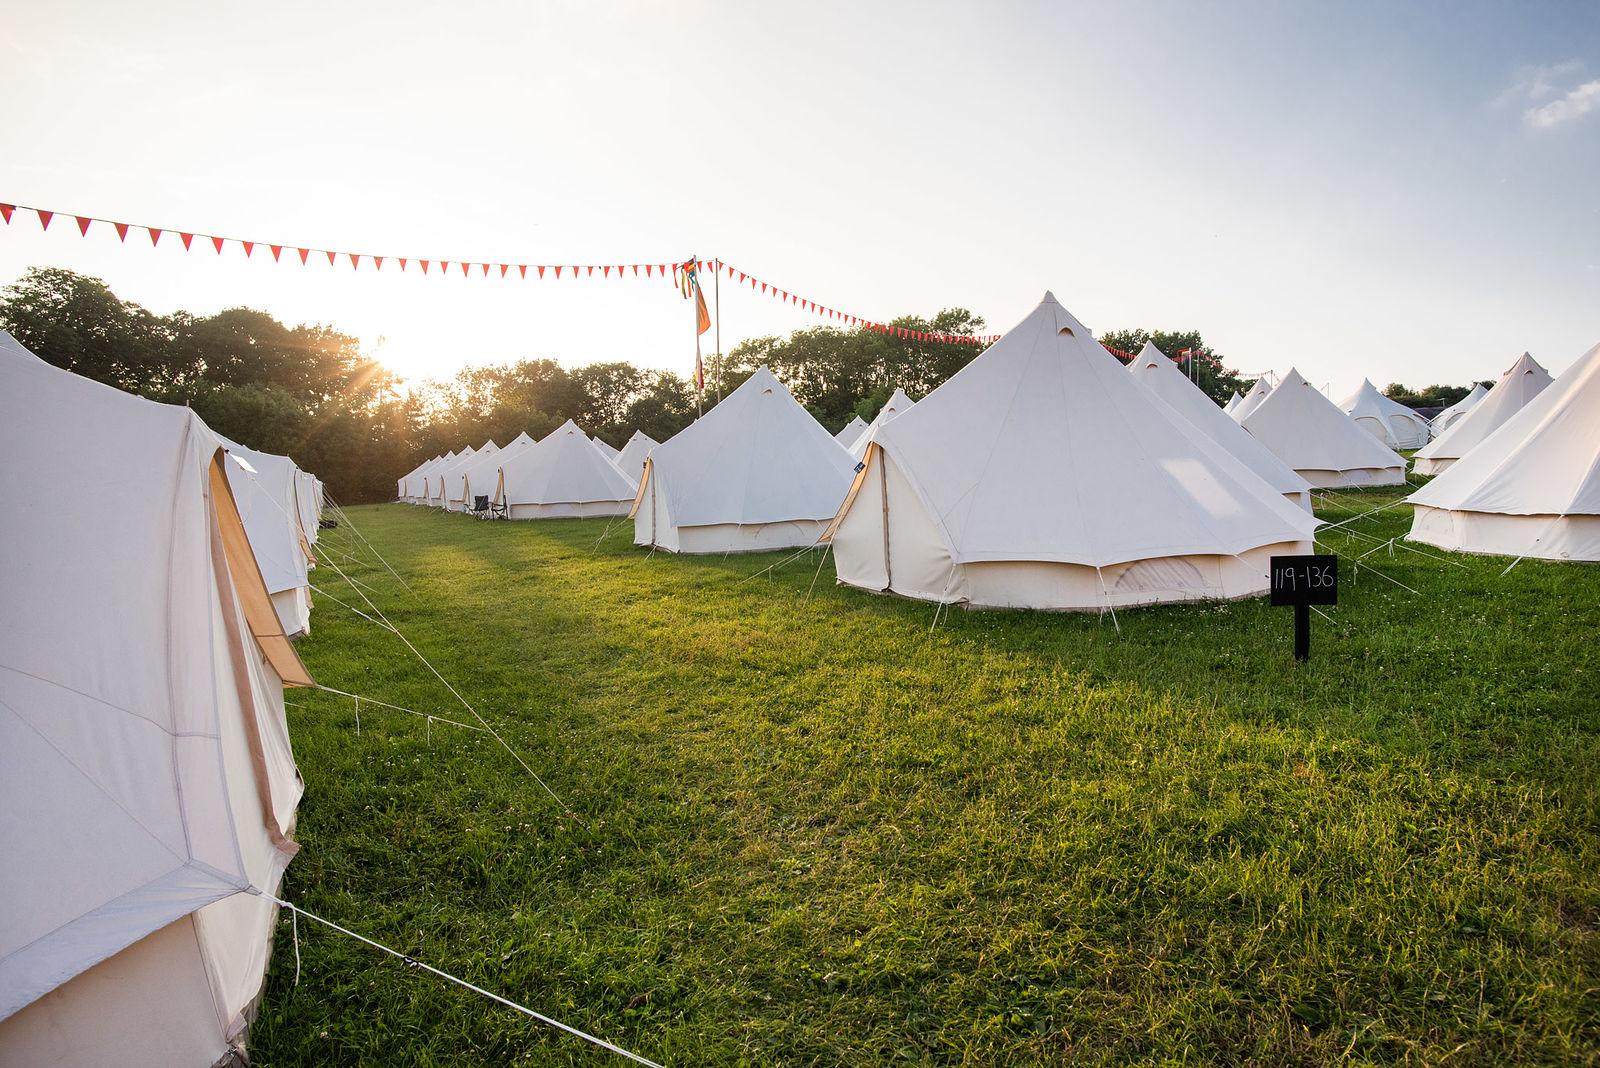 Download Festival 2018